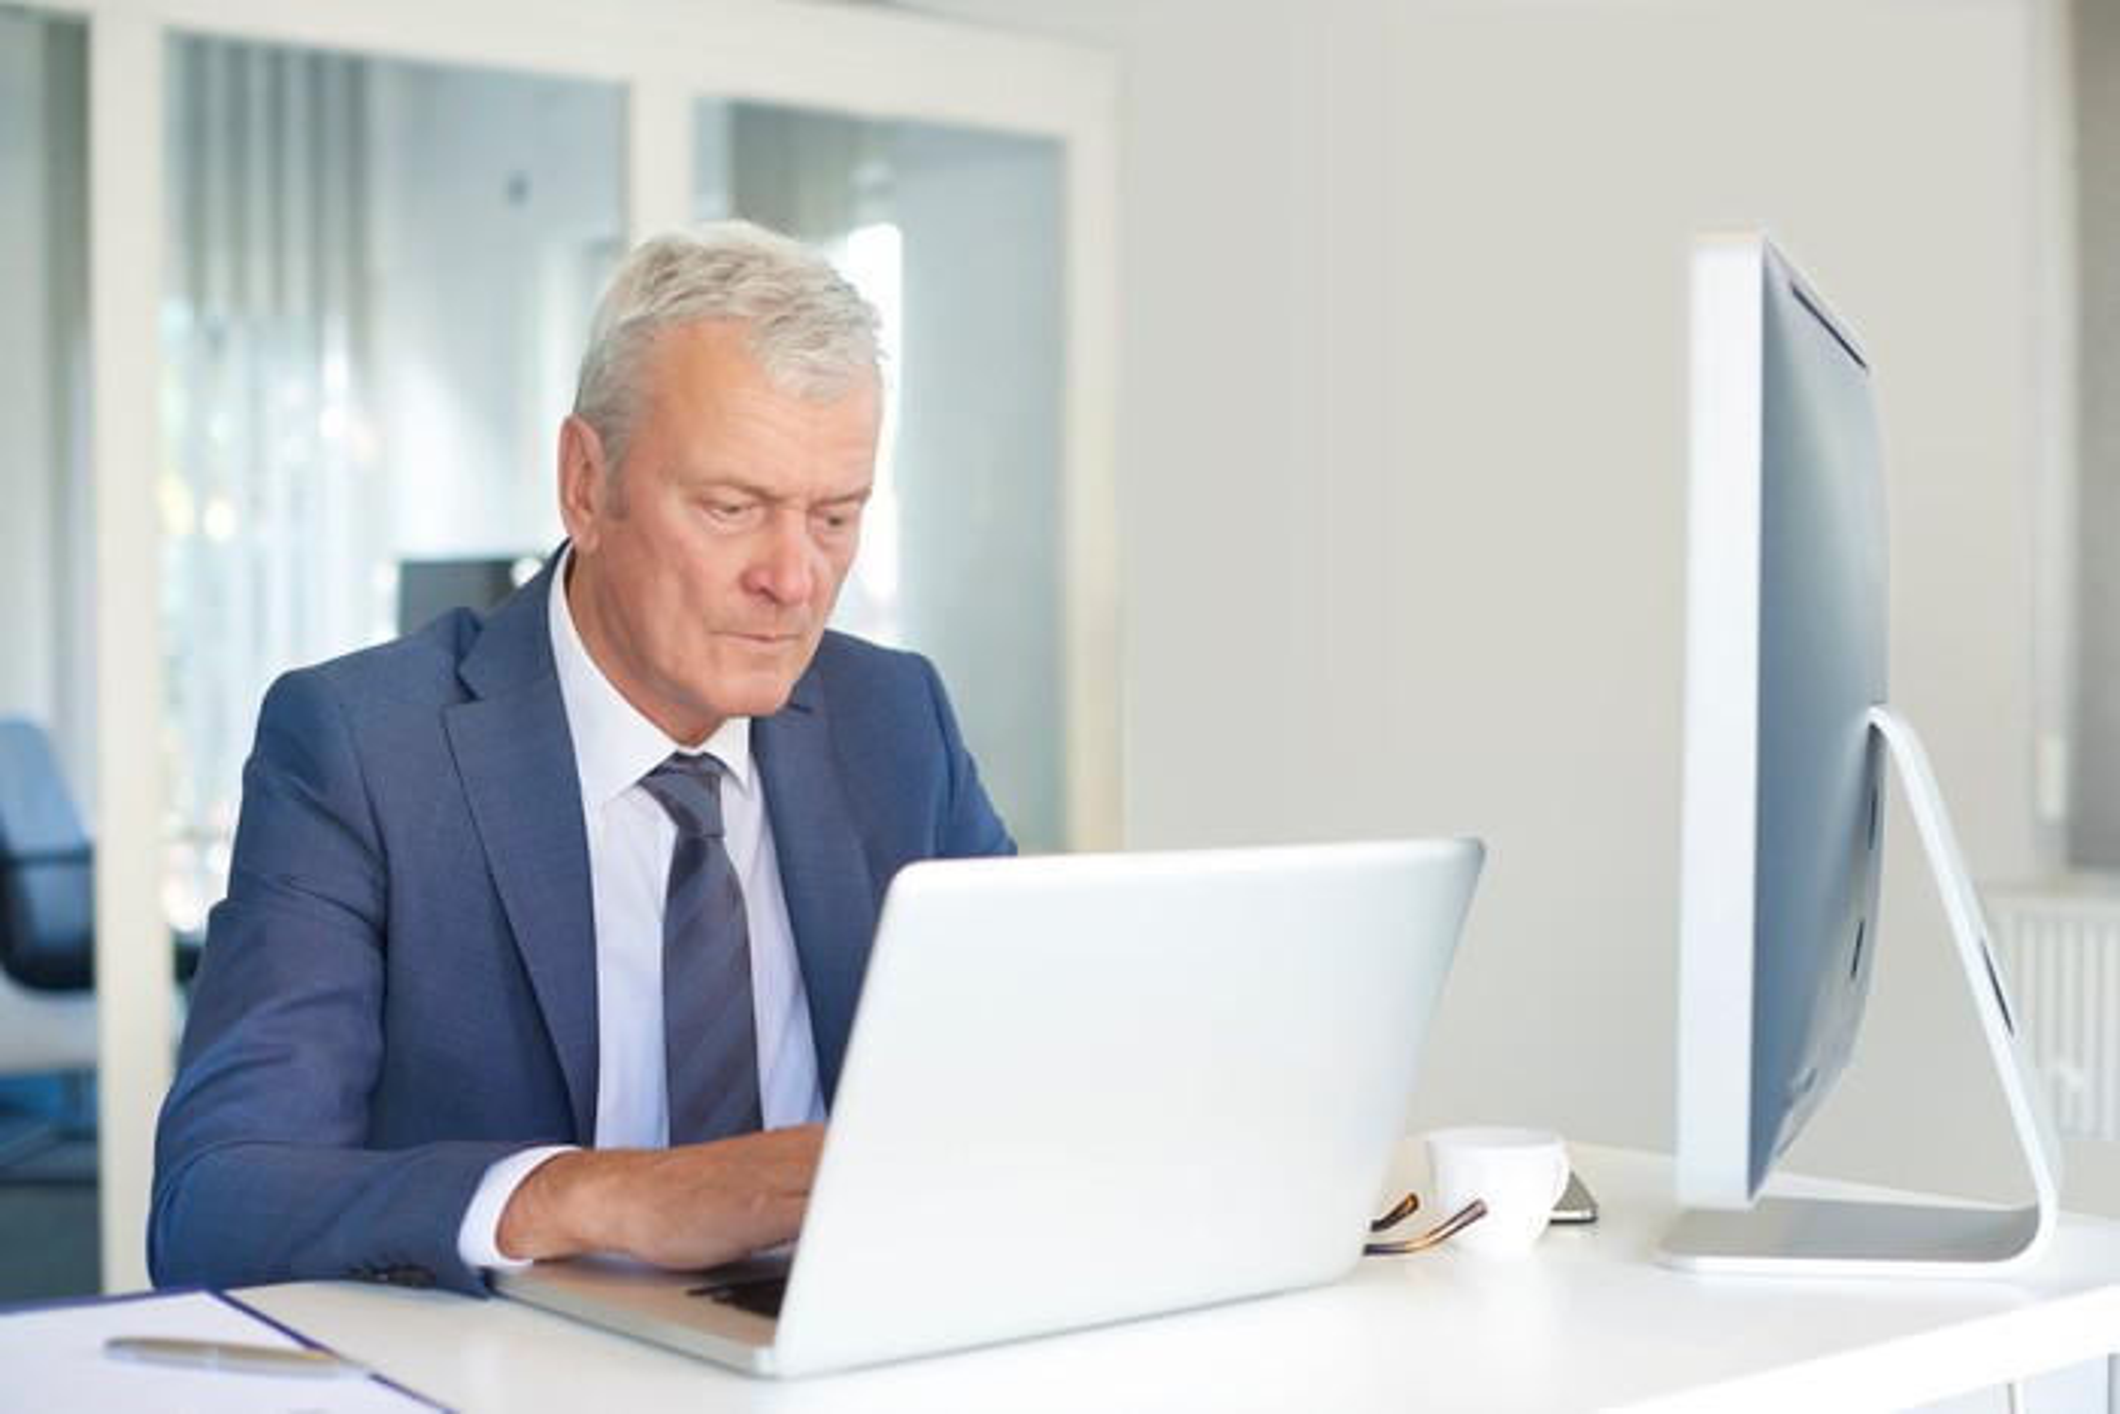 Older man in suit at a laptop.